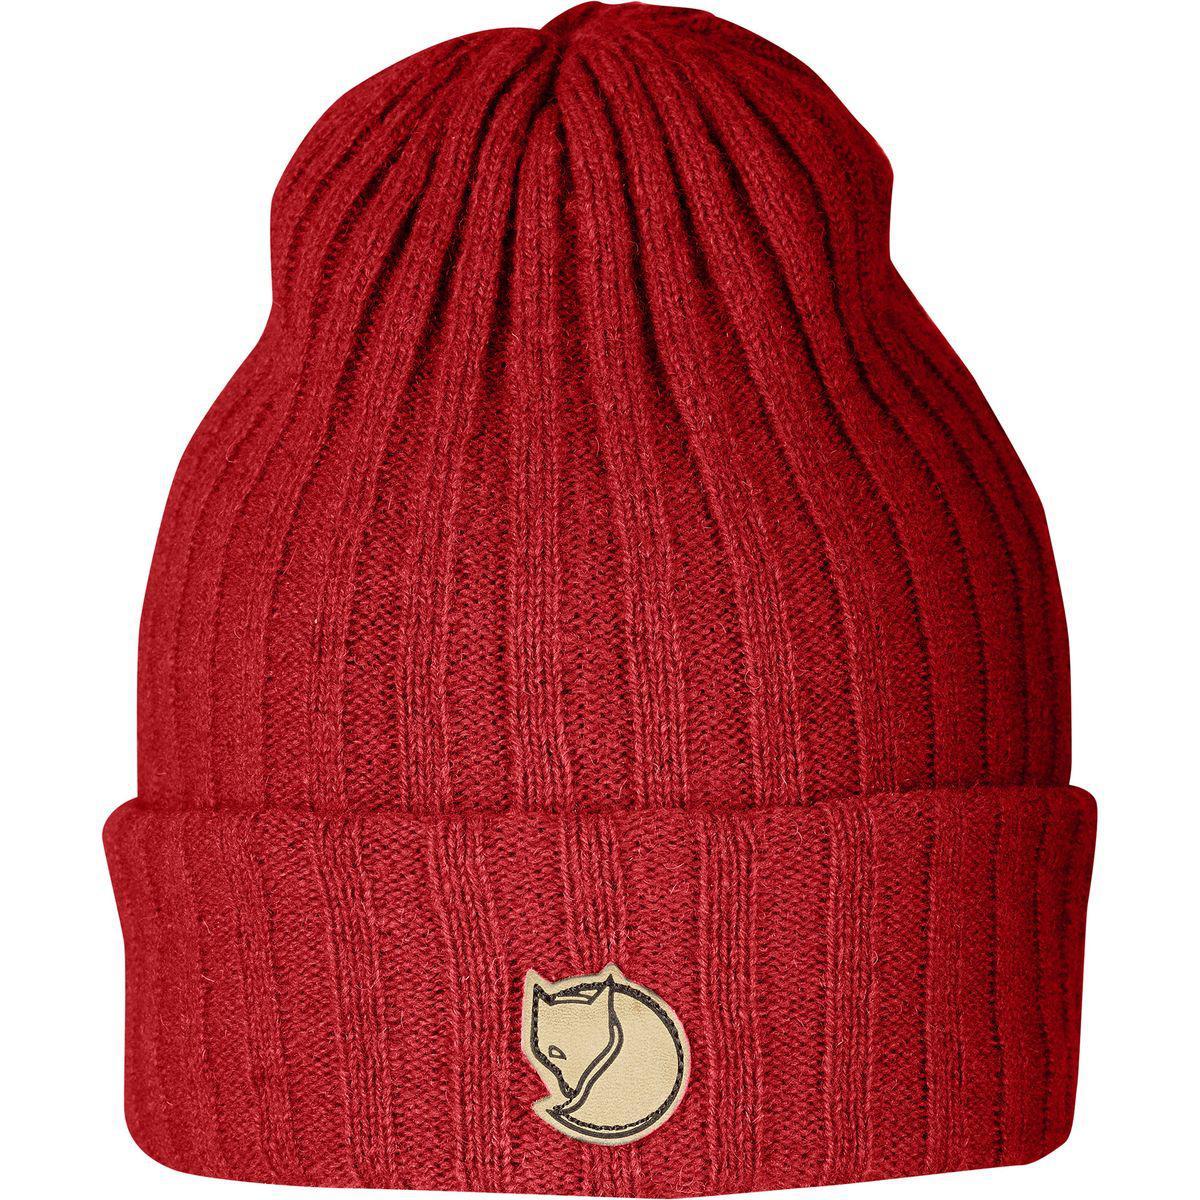 Lyst - Fjallraven Byron Hat in Red for Men 88013486470e